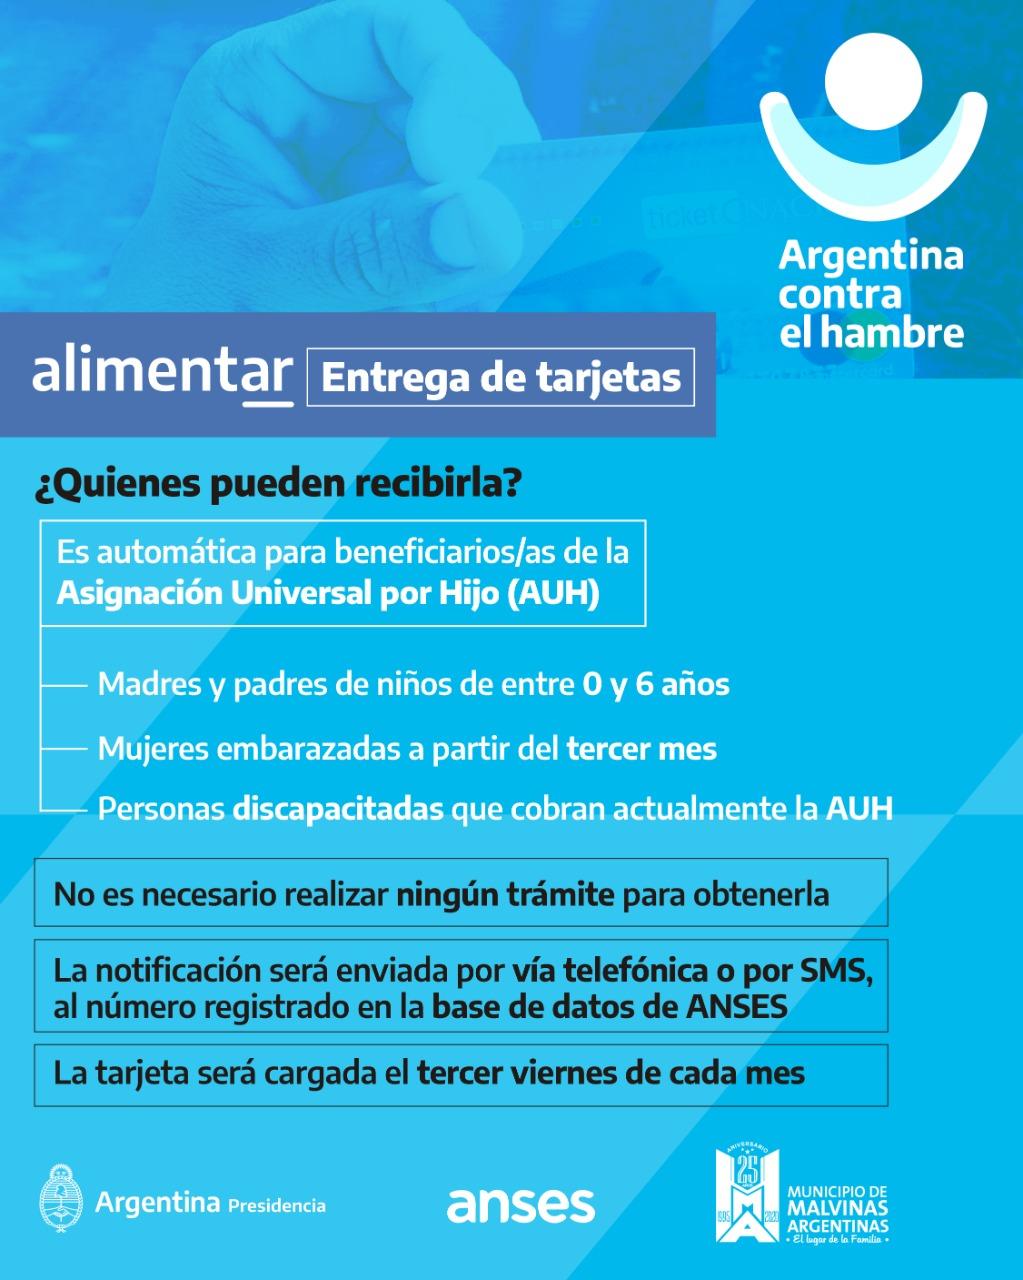 Malvinas Argentinas: entrega de tarjetas alimentarias. Whatsa25